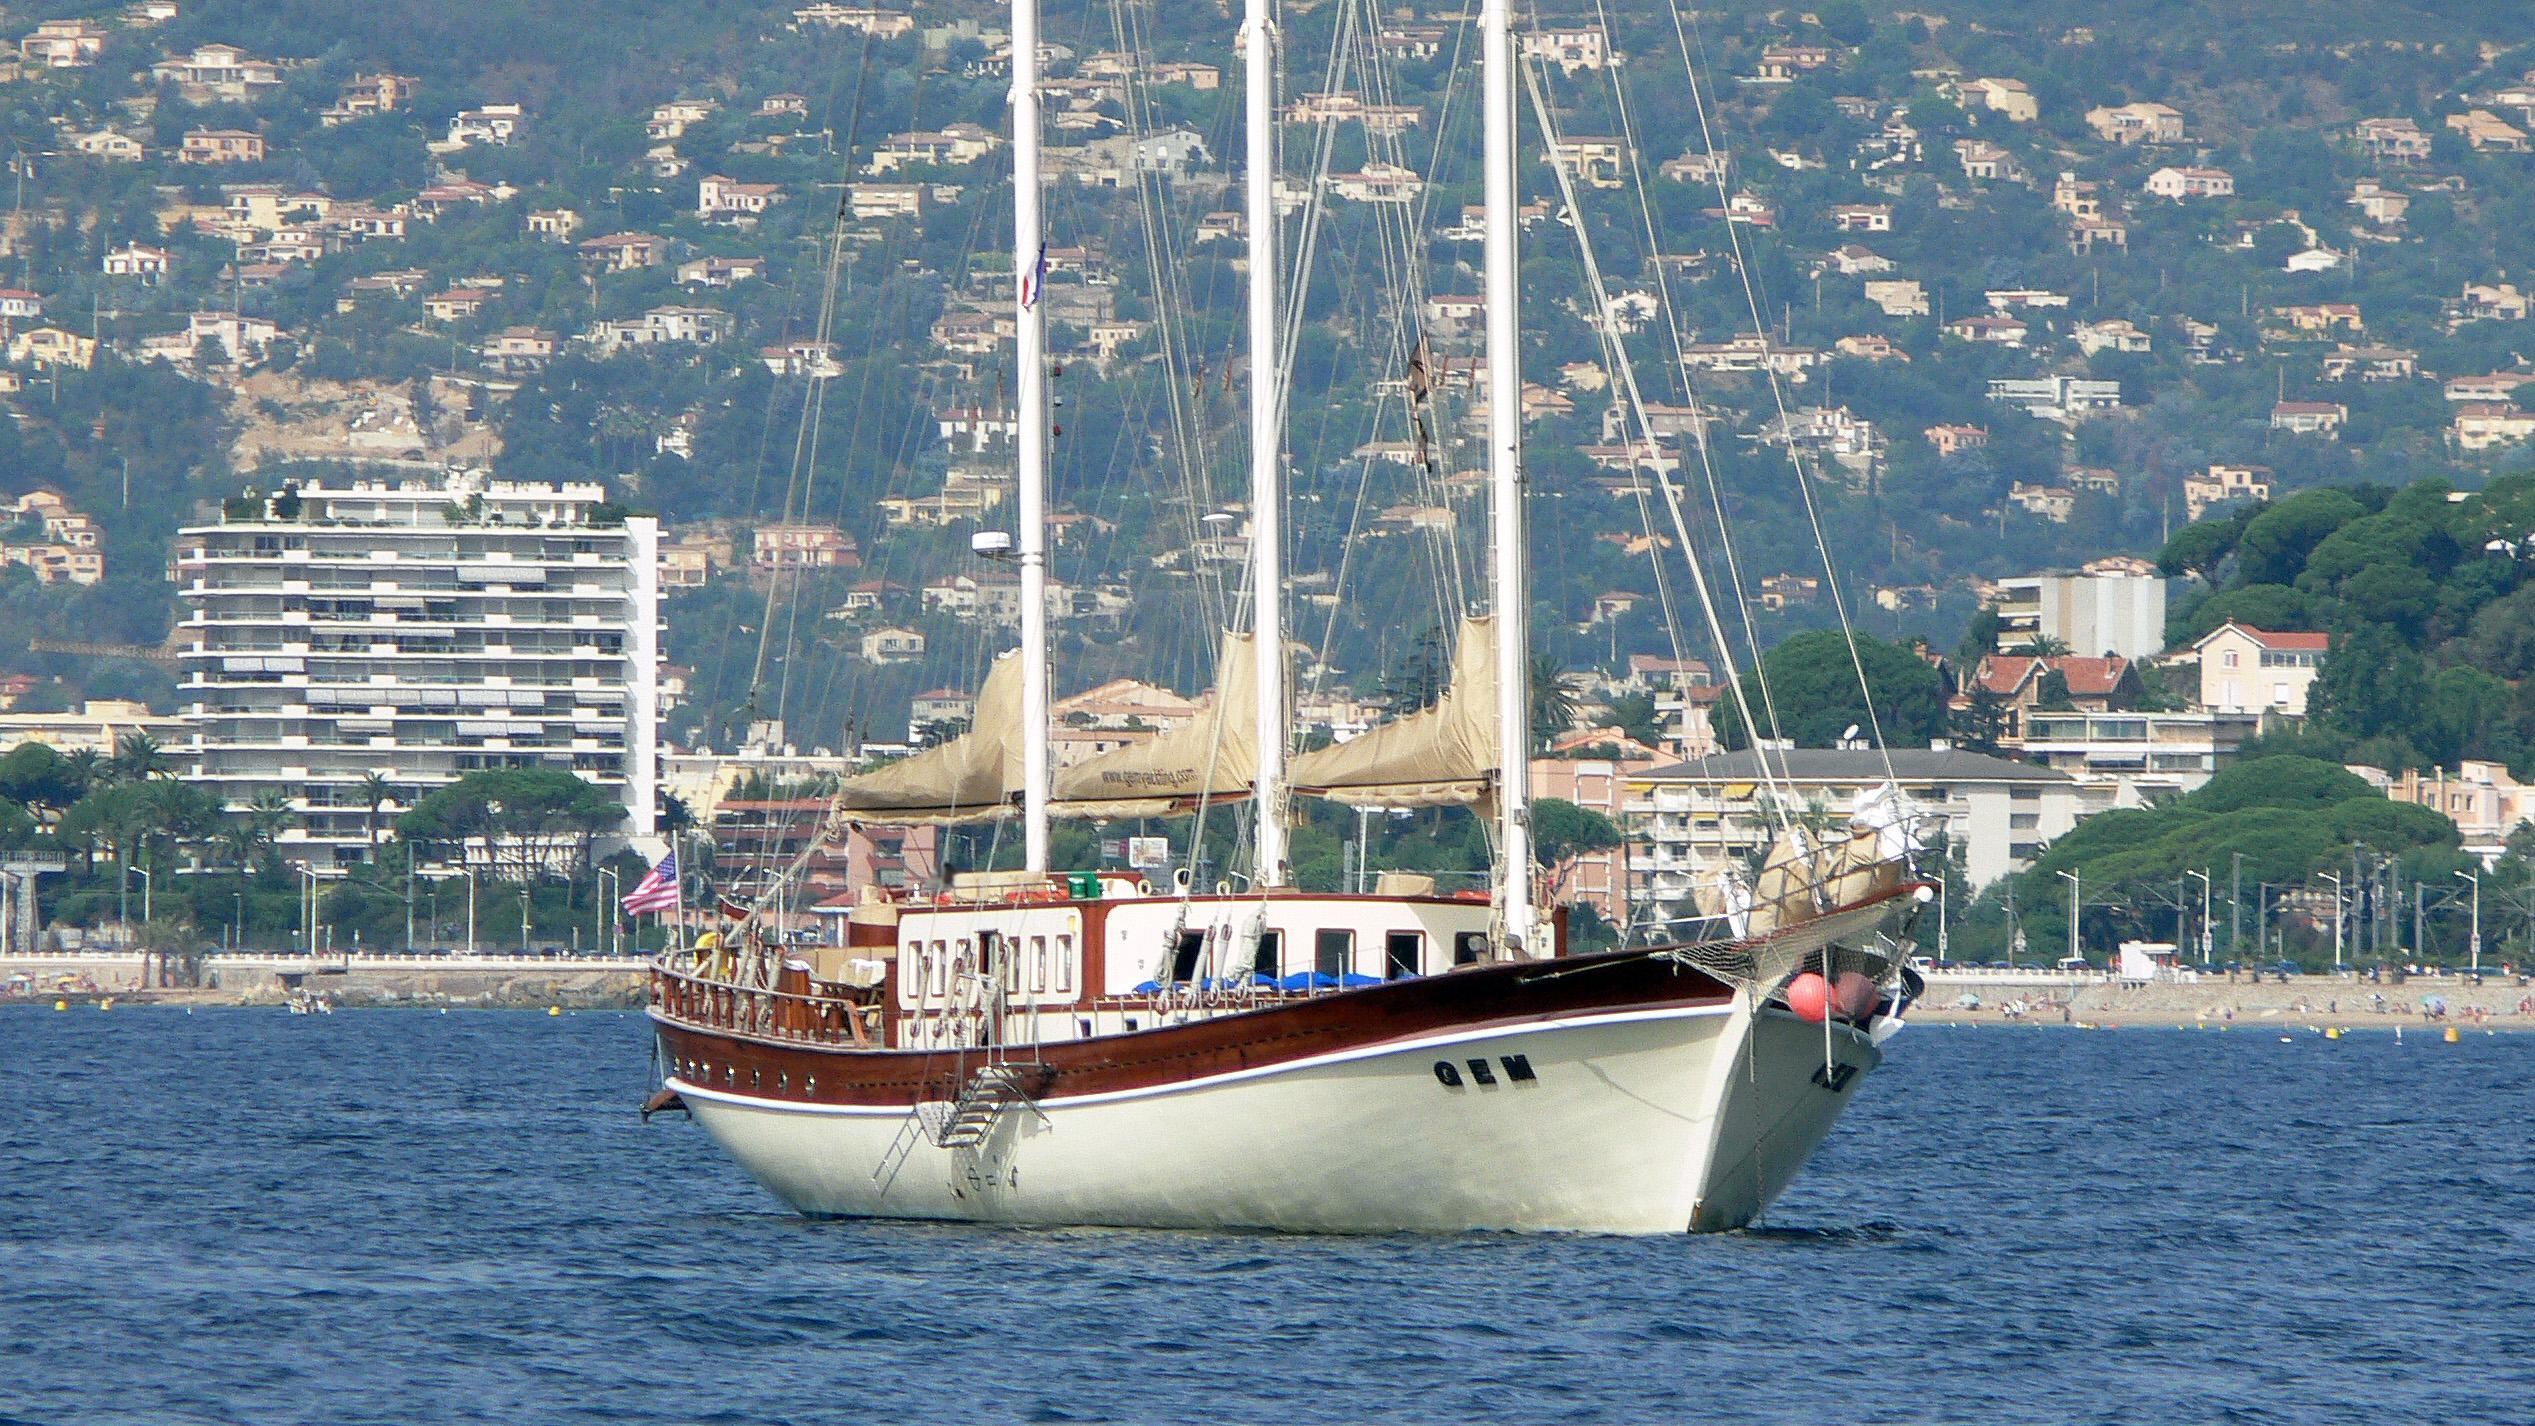 gem-sailing-yacht-aegean-1998-40m-bow